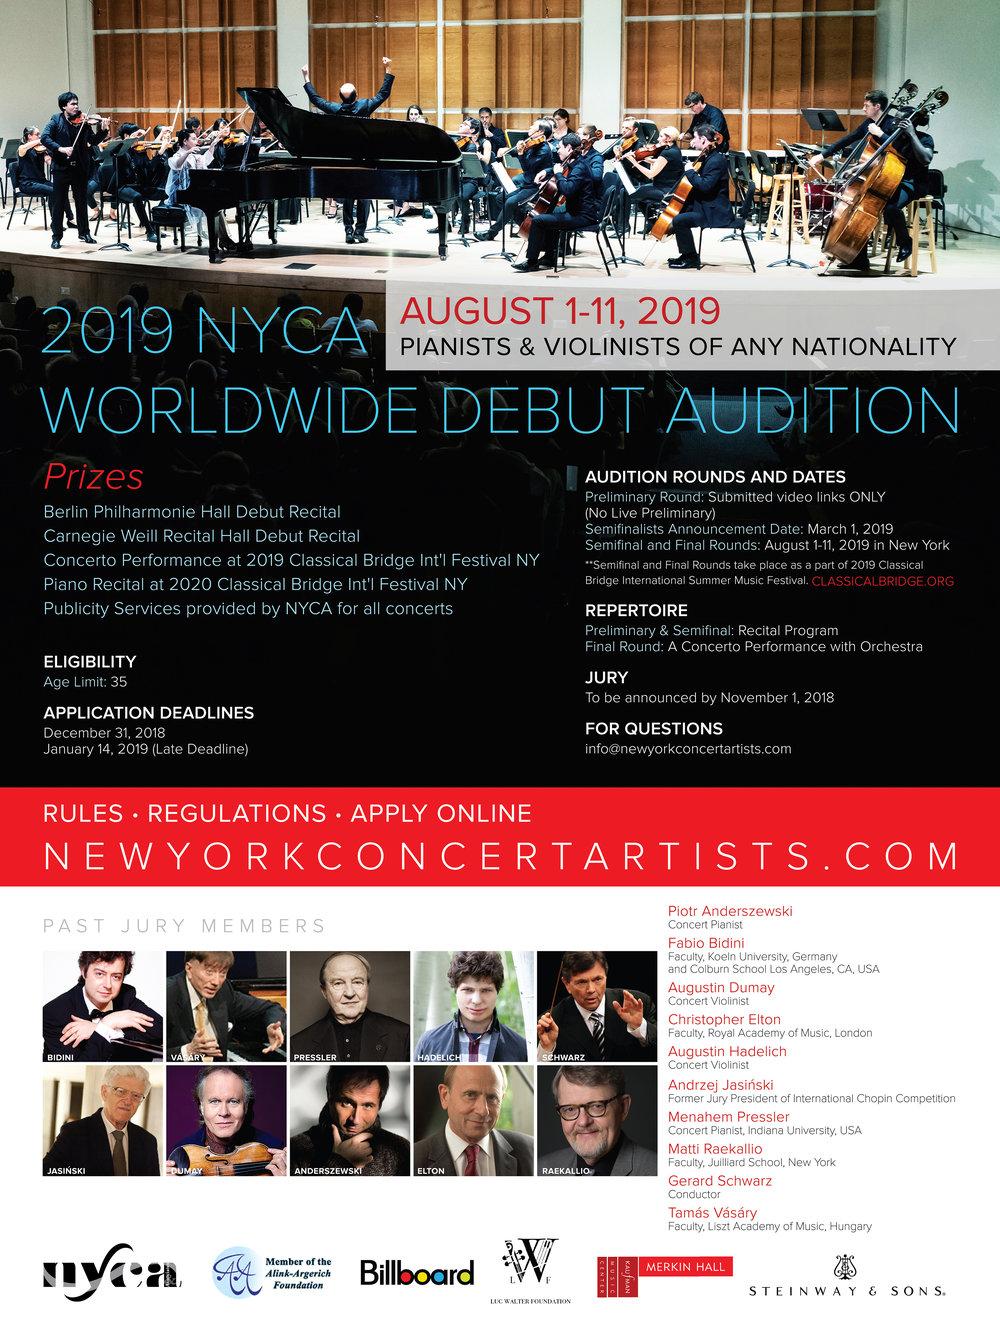 WEB-2019-NYCA_Worldwide_Audition_Poster.jpg